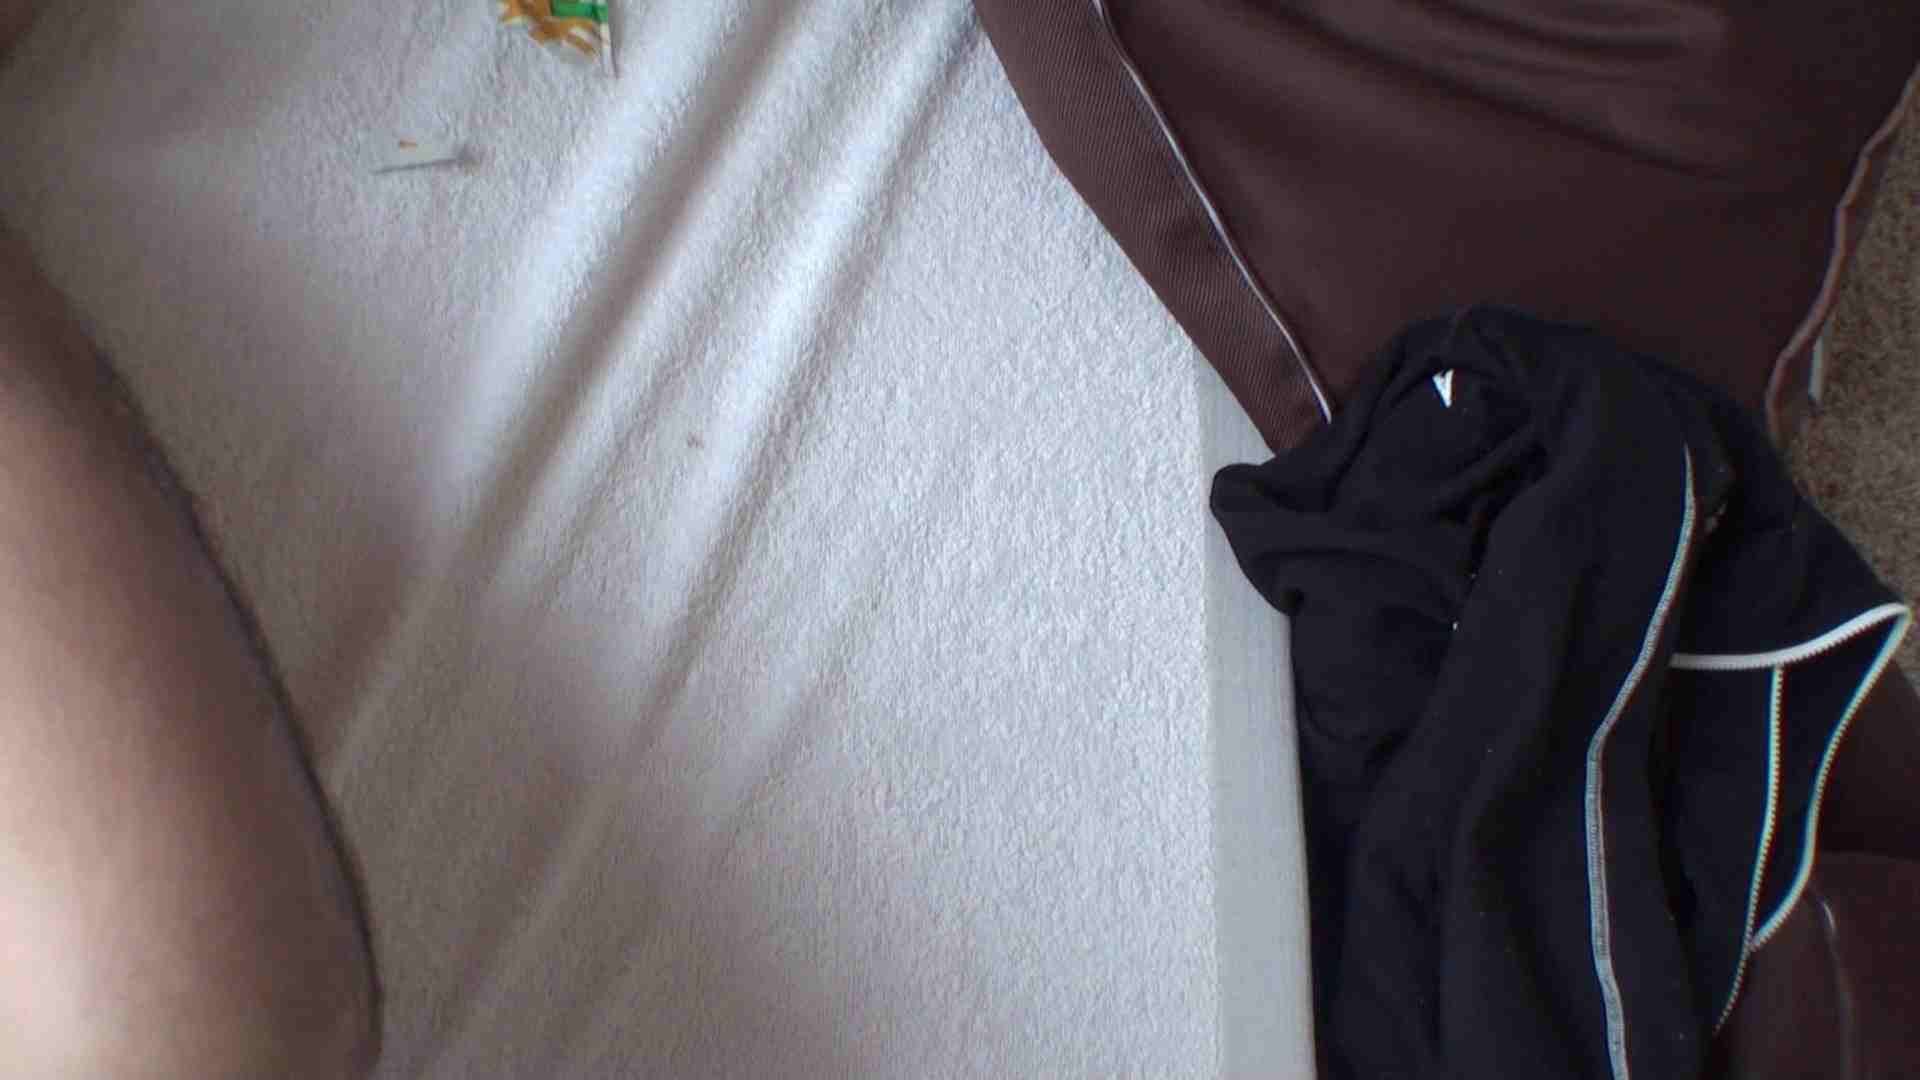 HD 良太と健二当たり前の日常 セックス編 男天国 | サル系ボーイズ  50pic 27